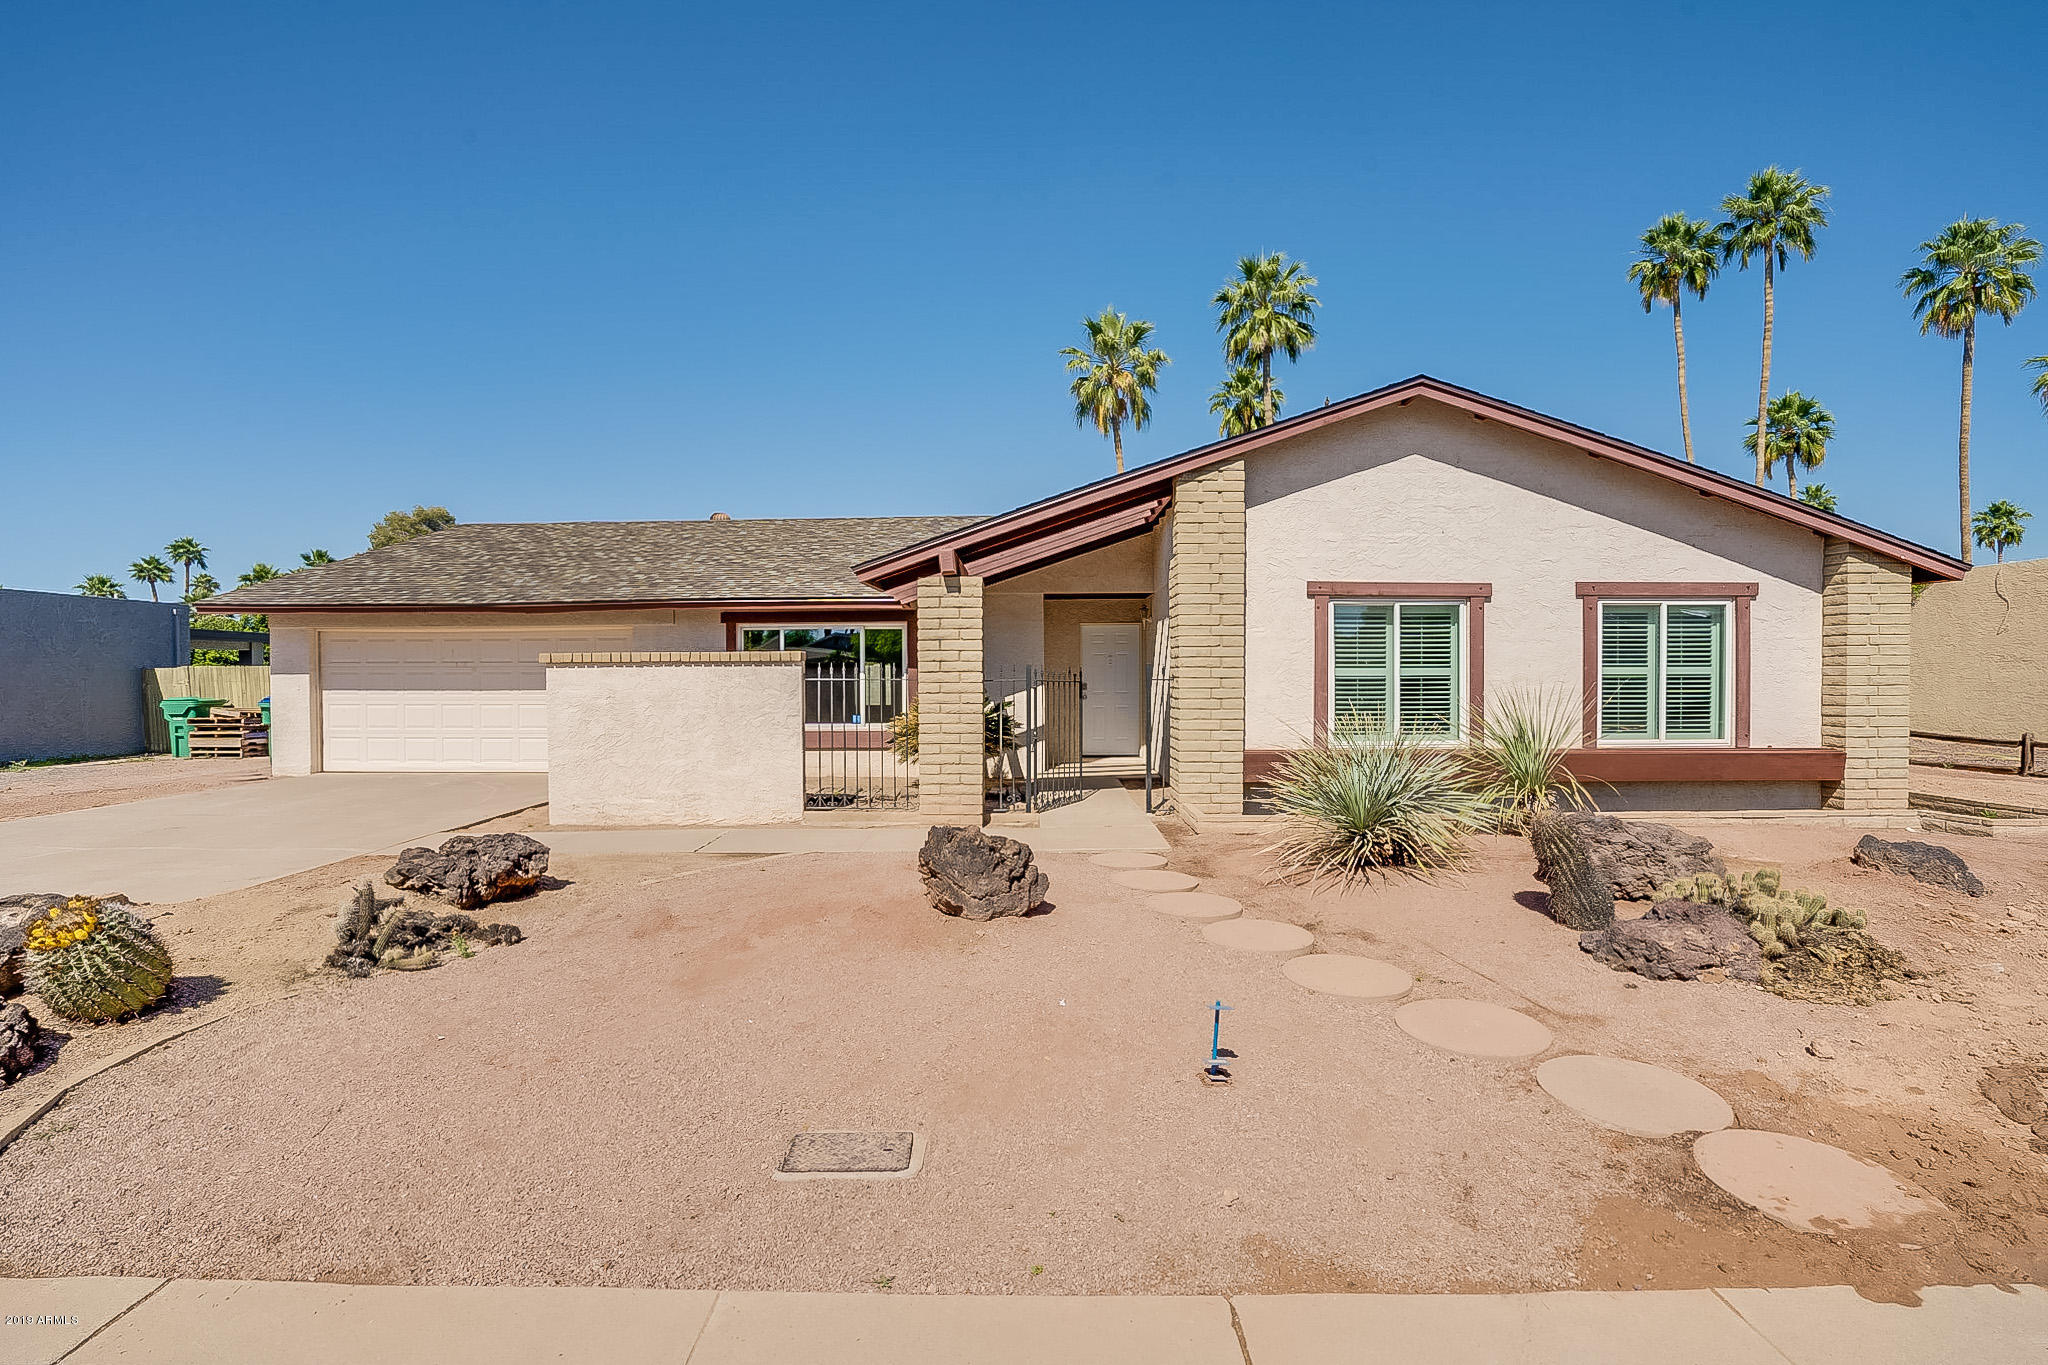 Photo of 1810 S PALMER --, Mesa, AZ 85210